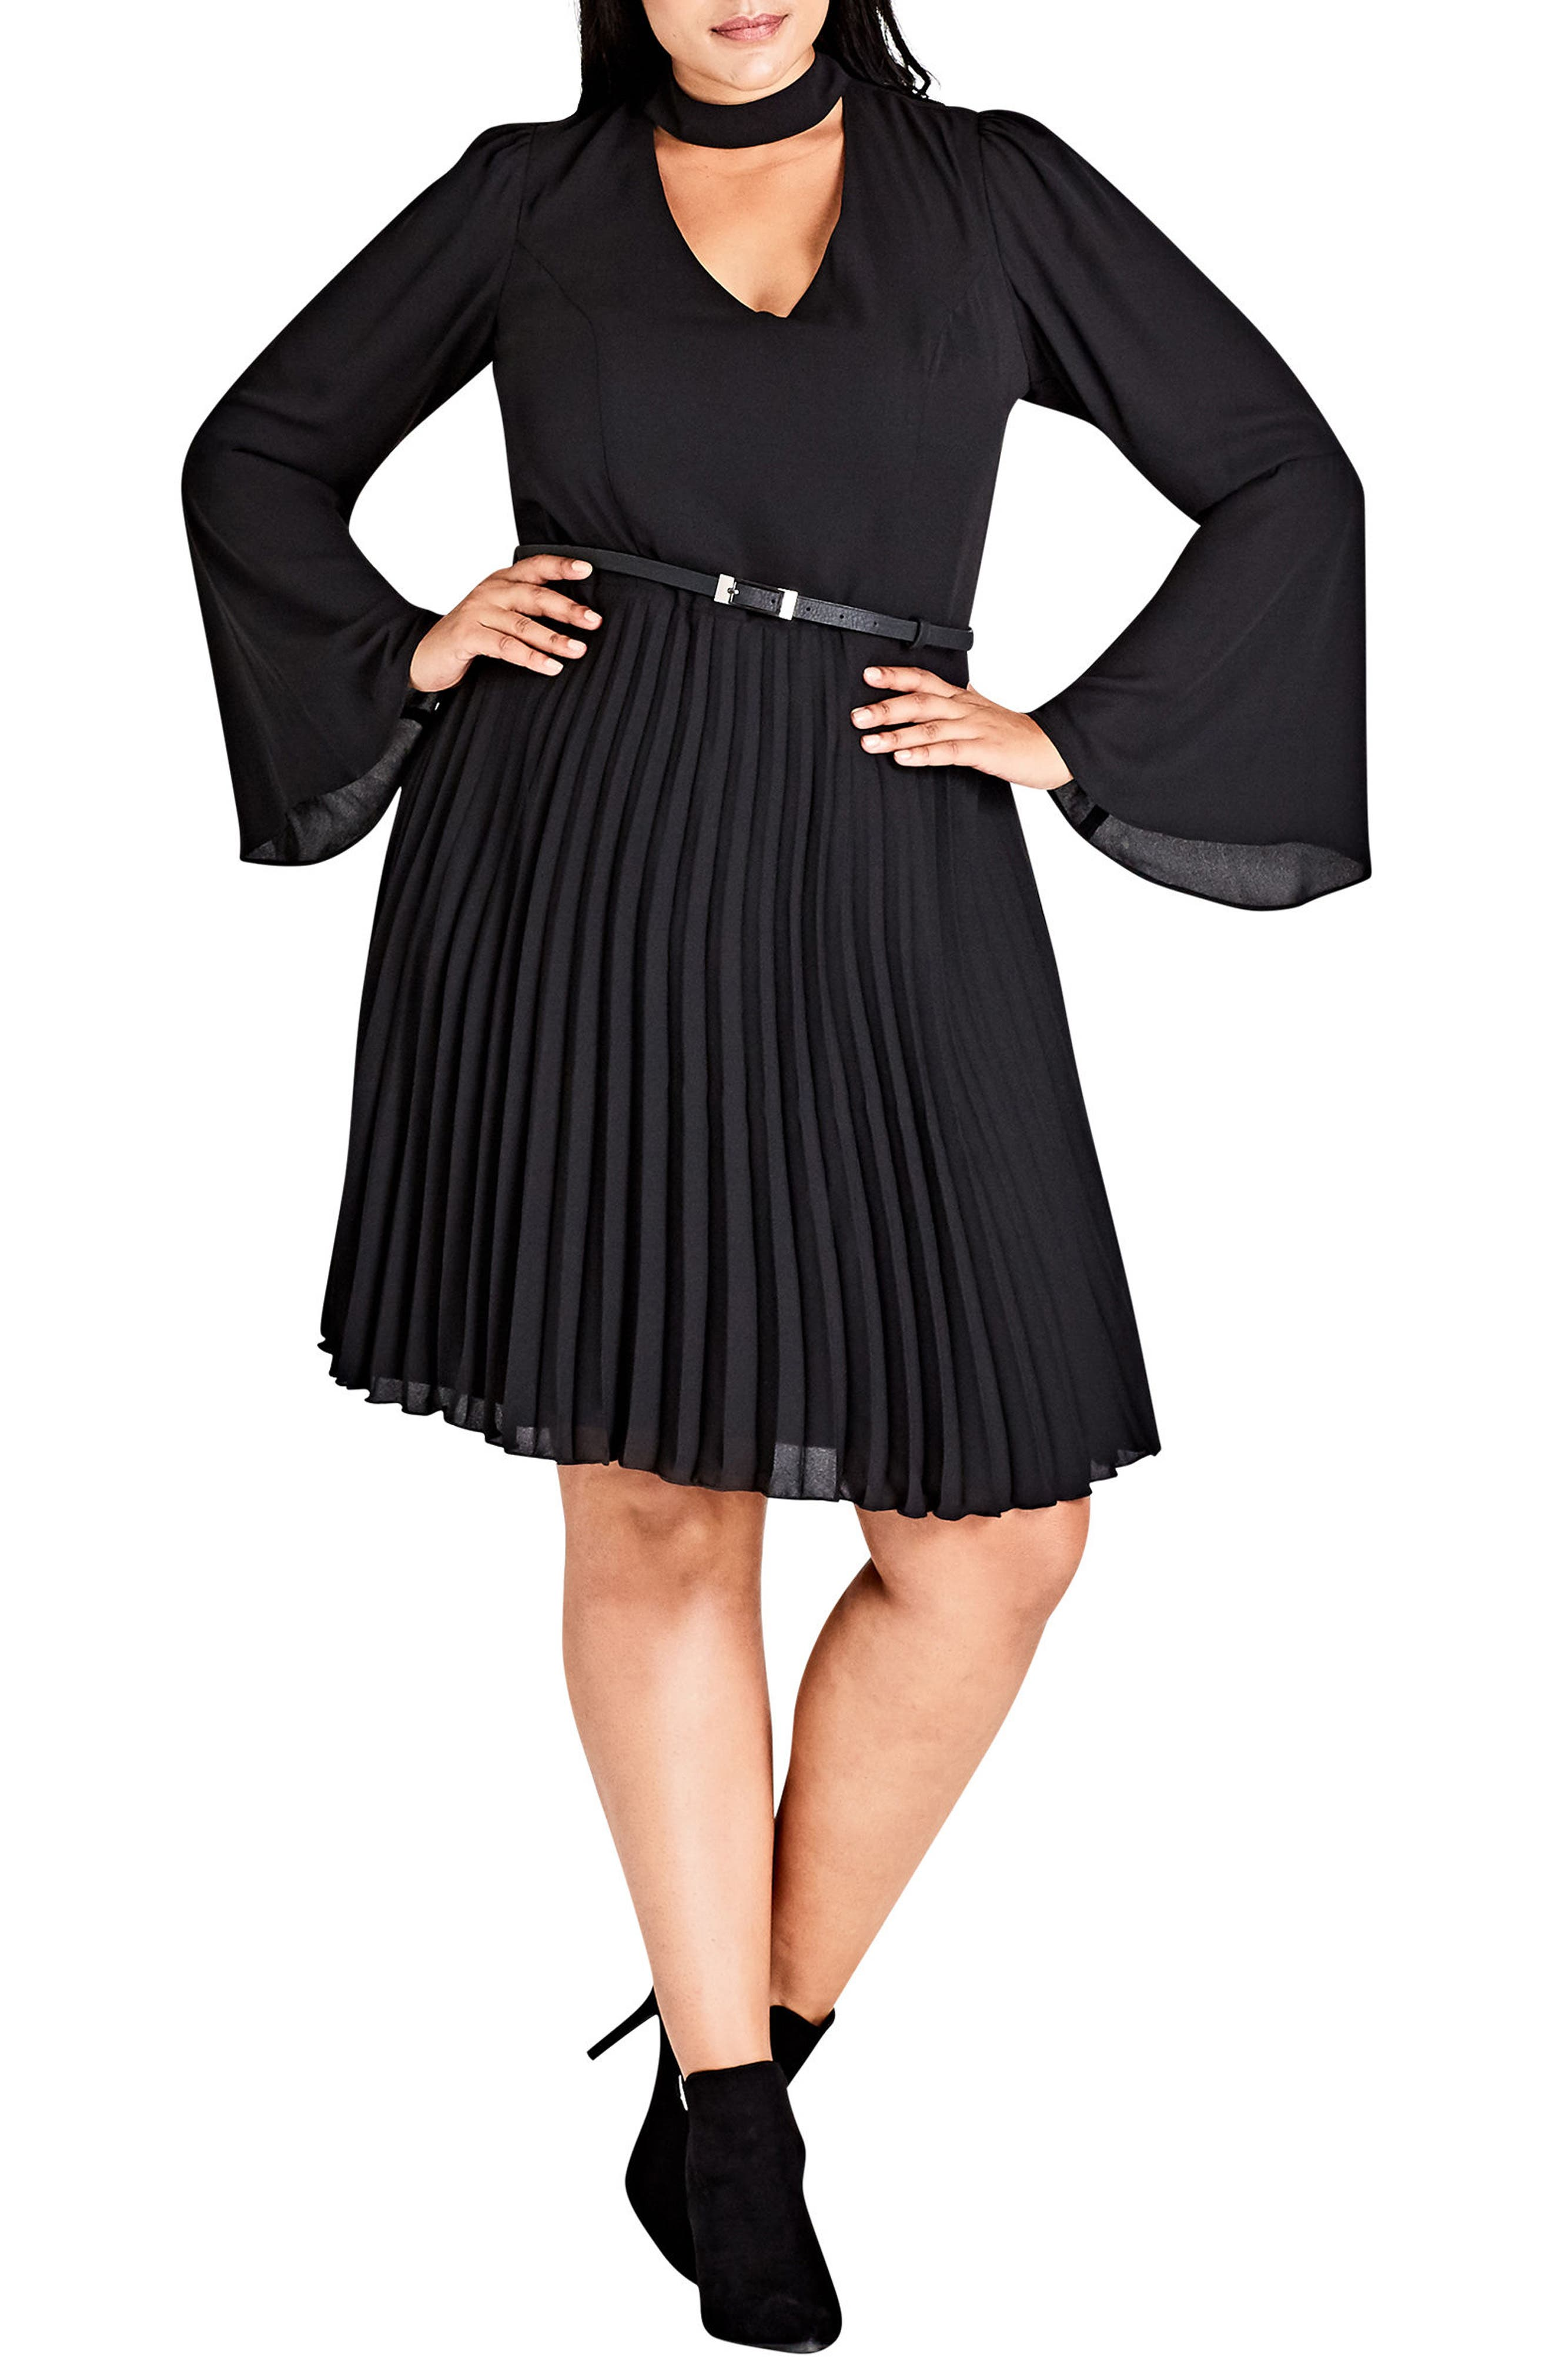 Main Image - City Chic Praise Me Bell Sleeve Choker Neck Dress (Plus Size)